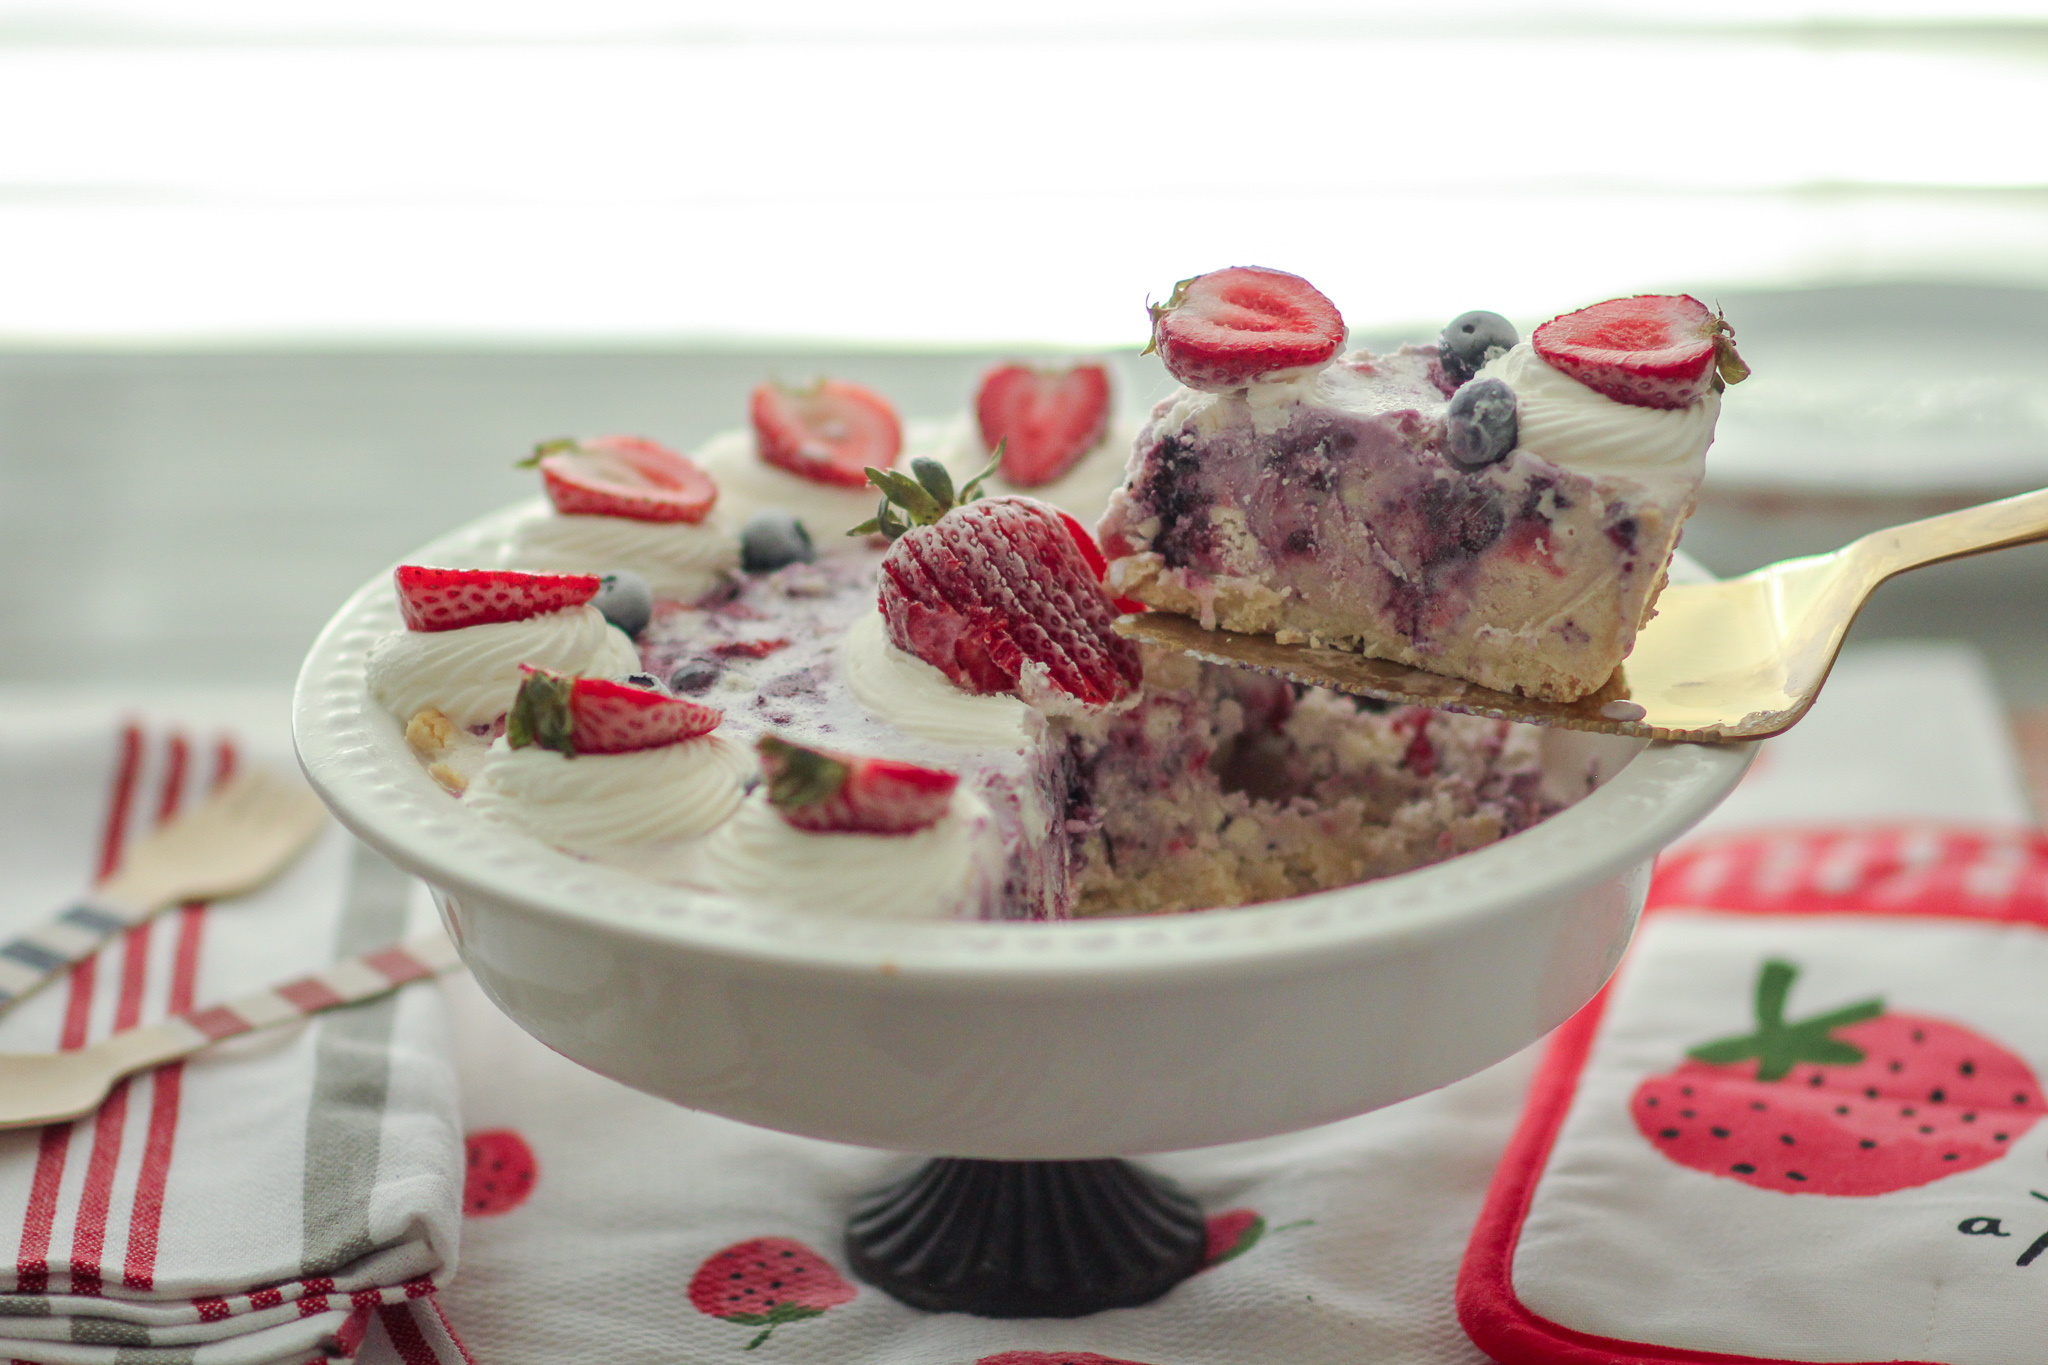 White Chocolate Strawberry Blueberry Ice Cream Cookie Pie